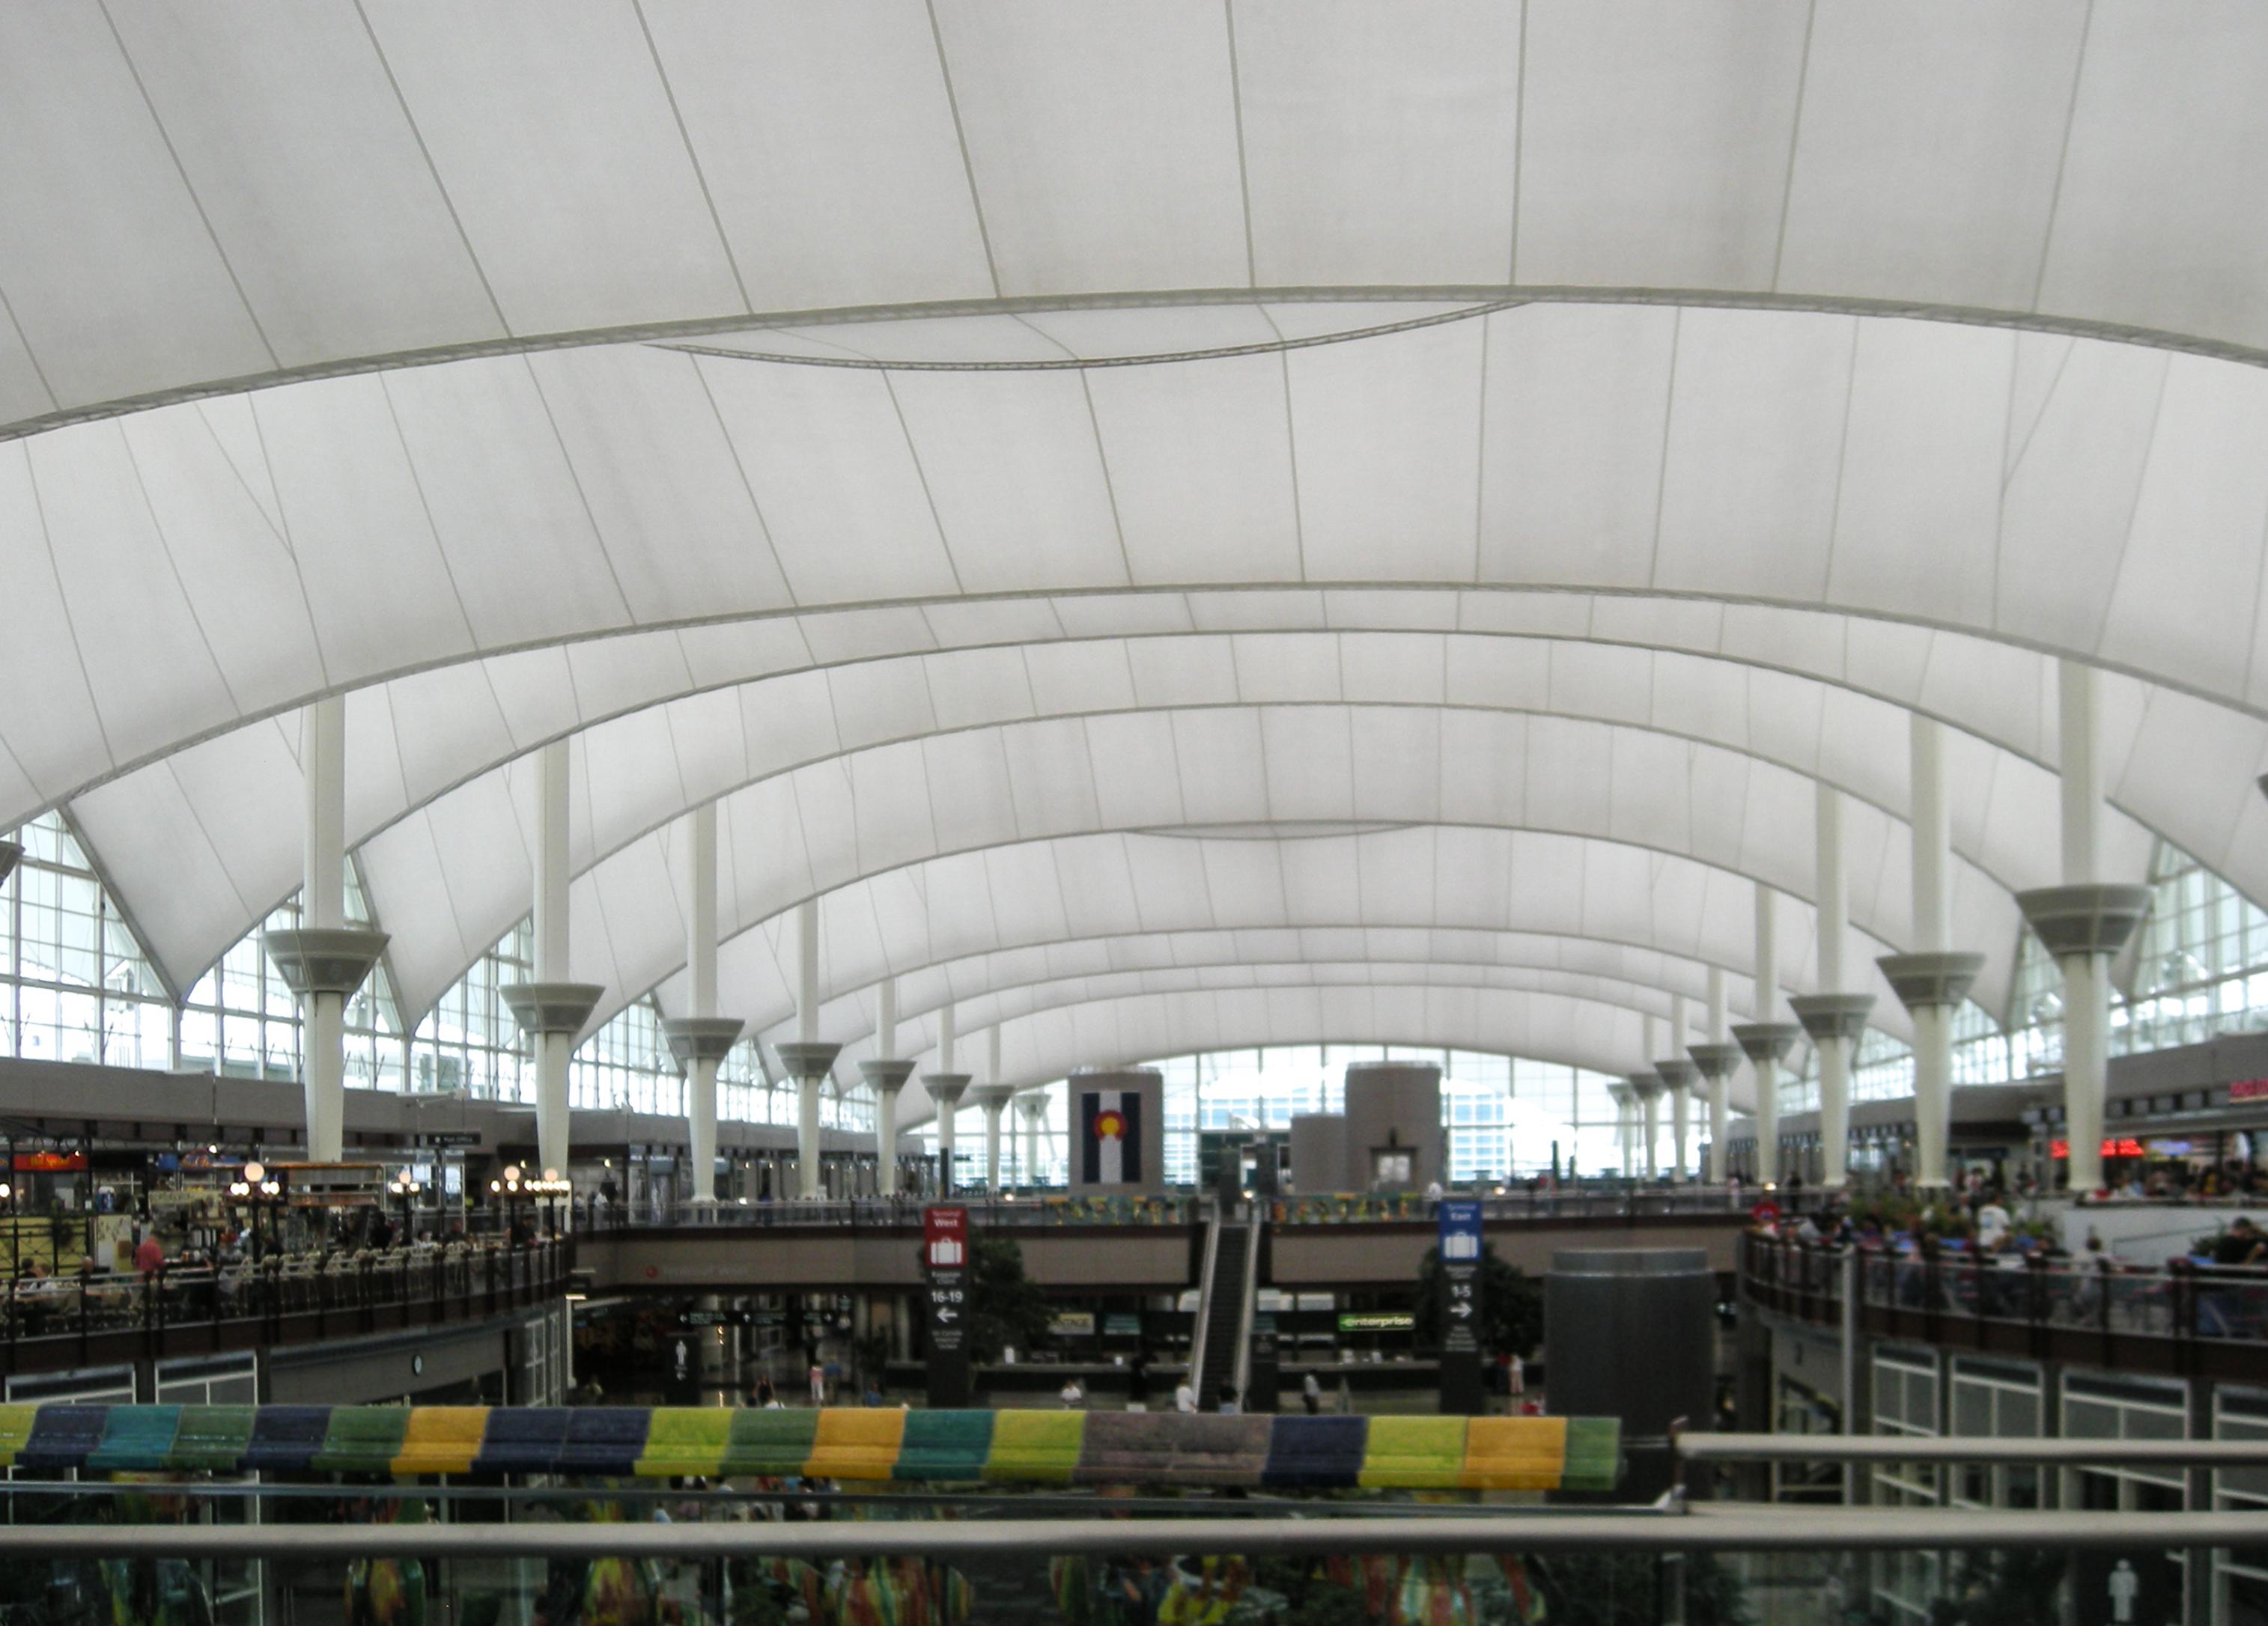 Flughafen Denver Bilder